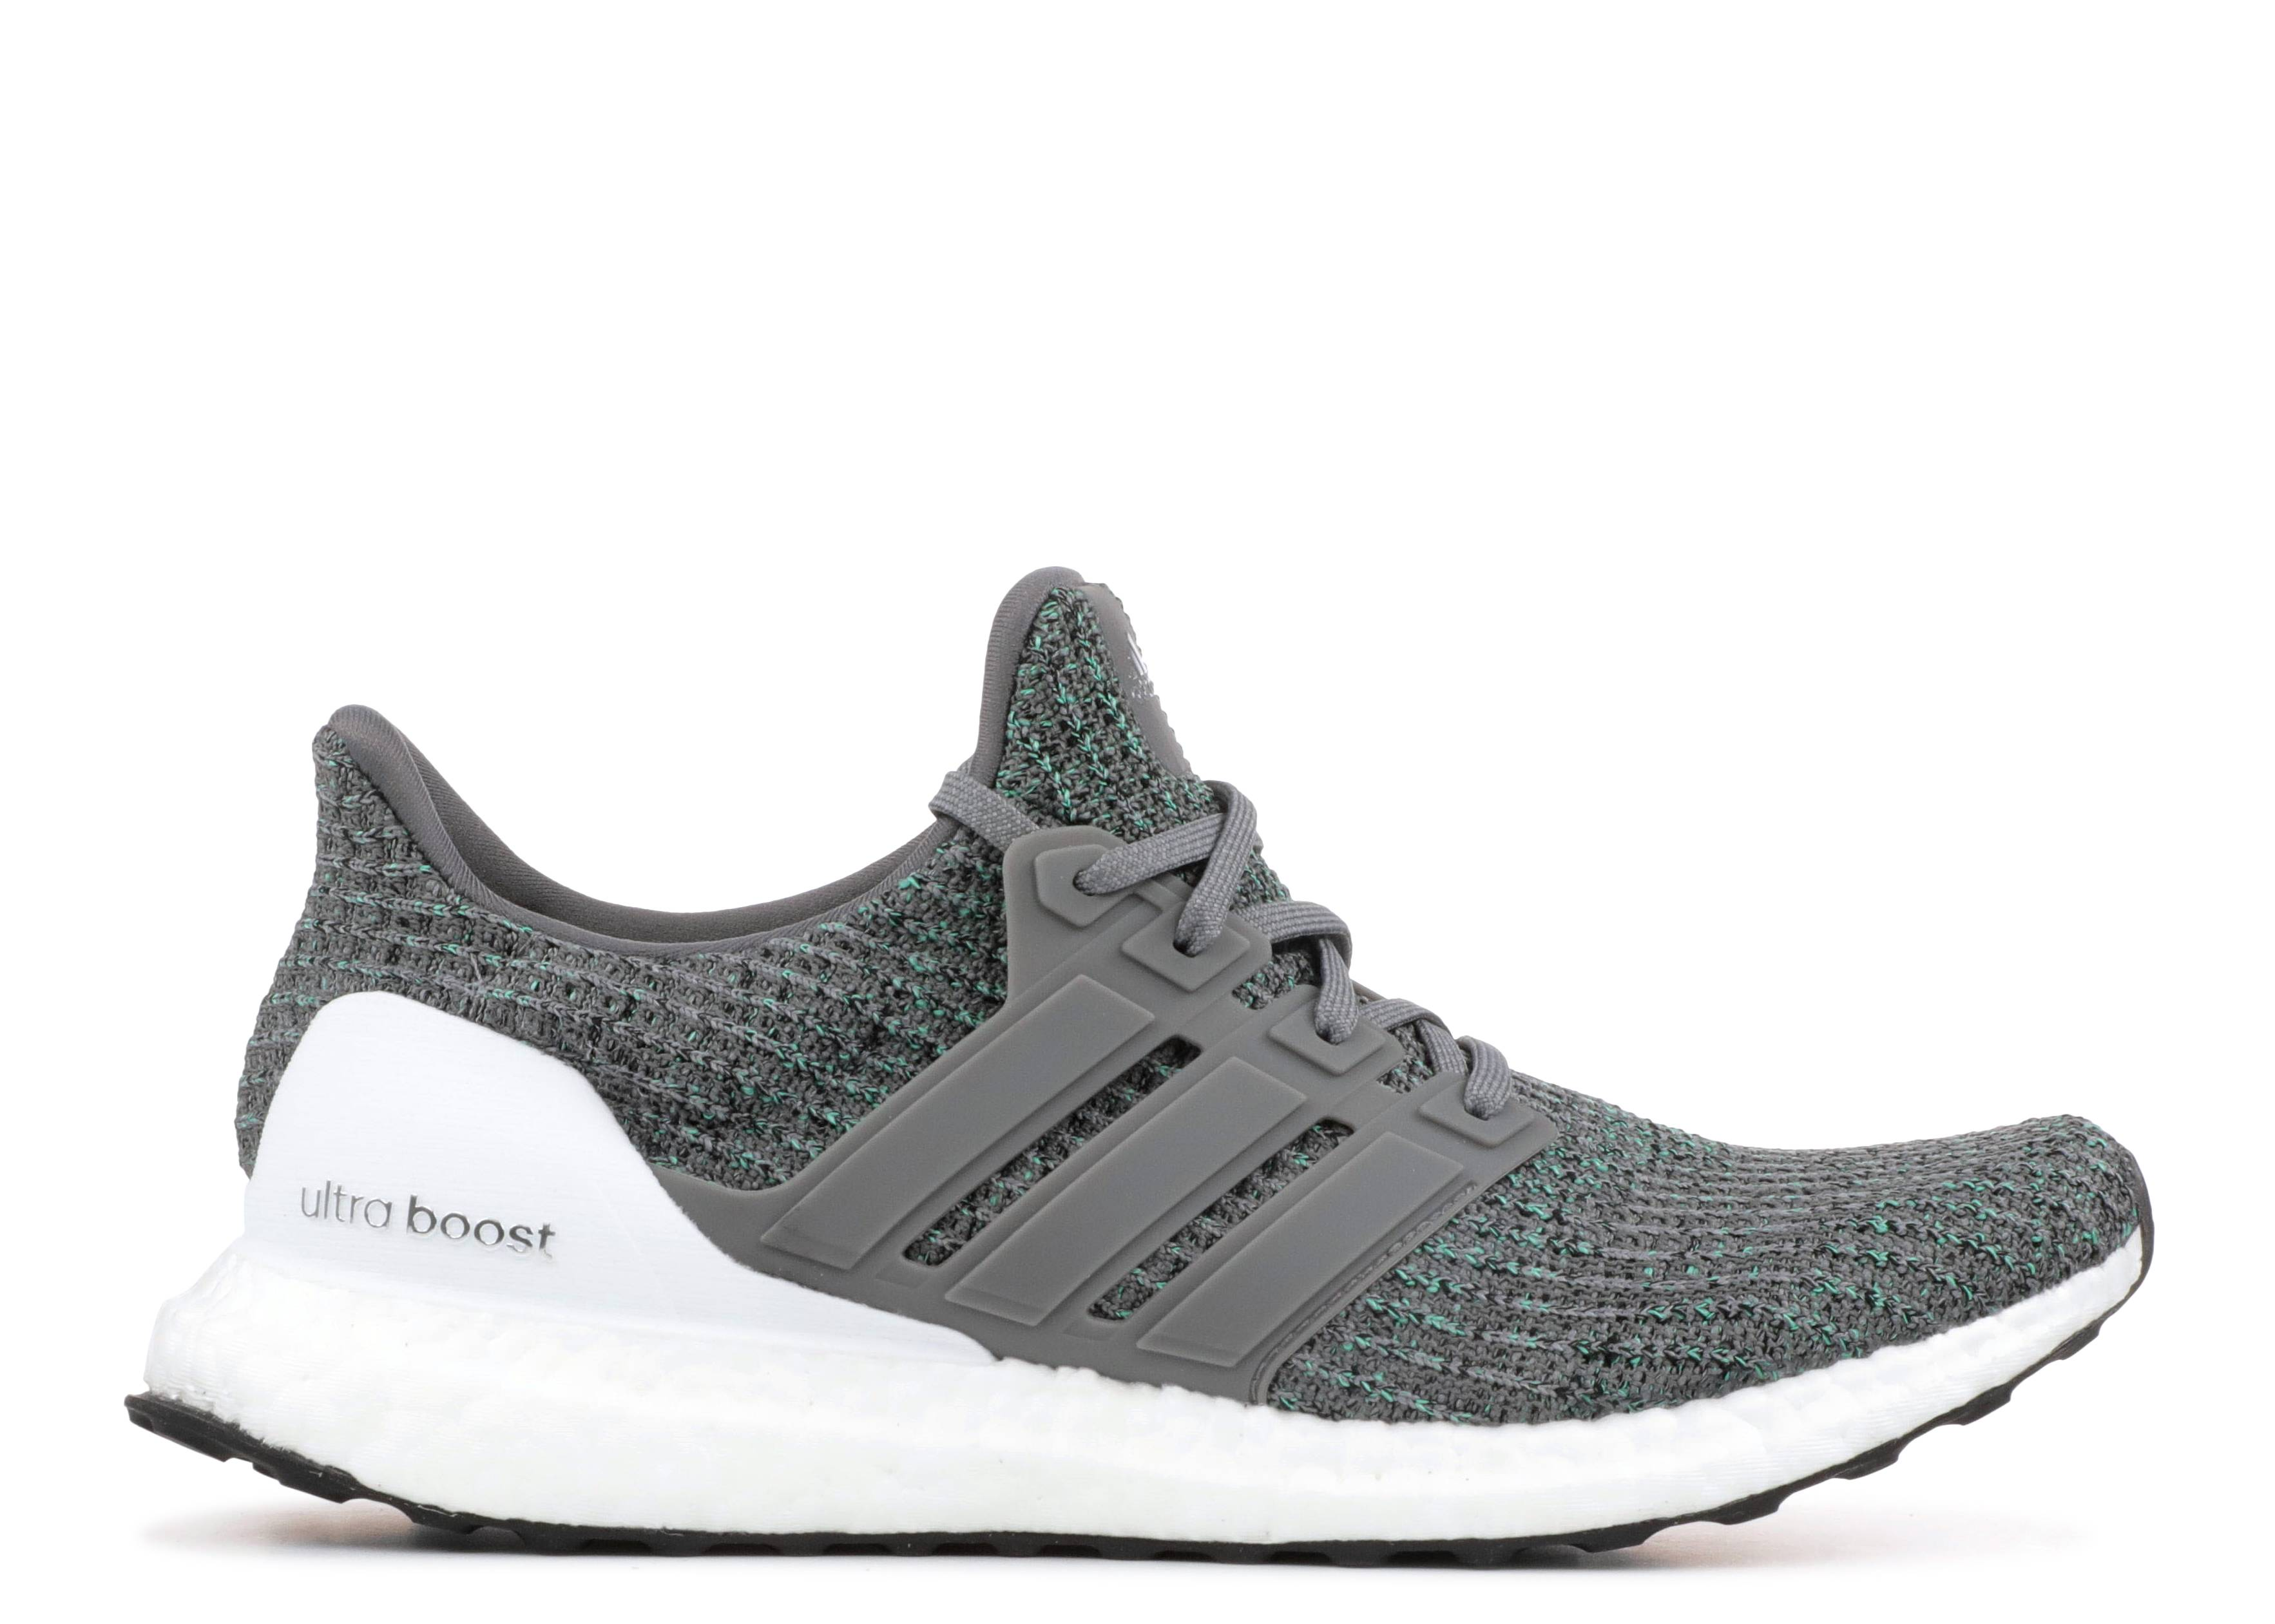 c7d4ea32b8c Ultra Boost - Adidas - cp9251 - grey four grey four - running white ...